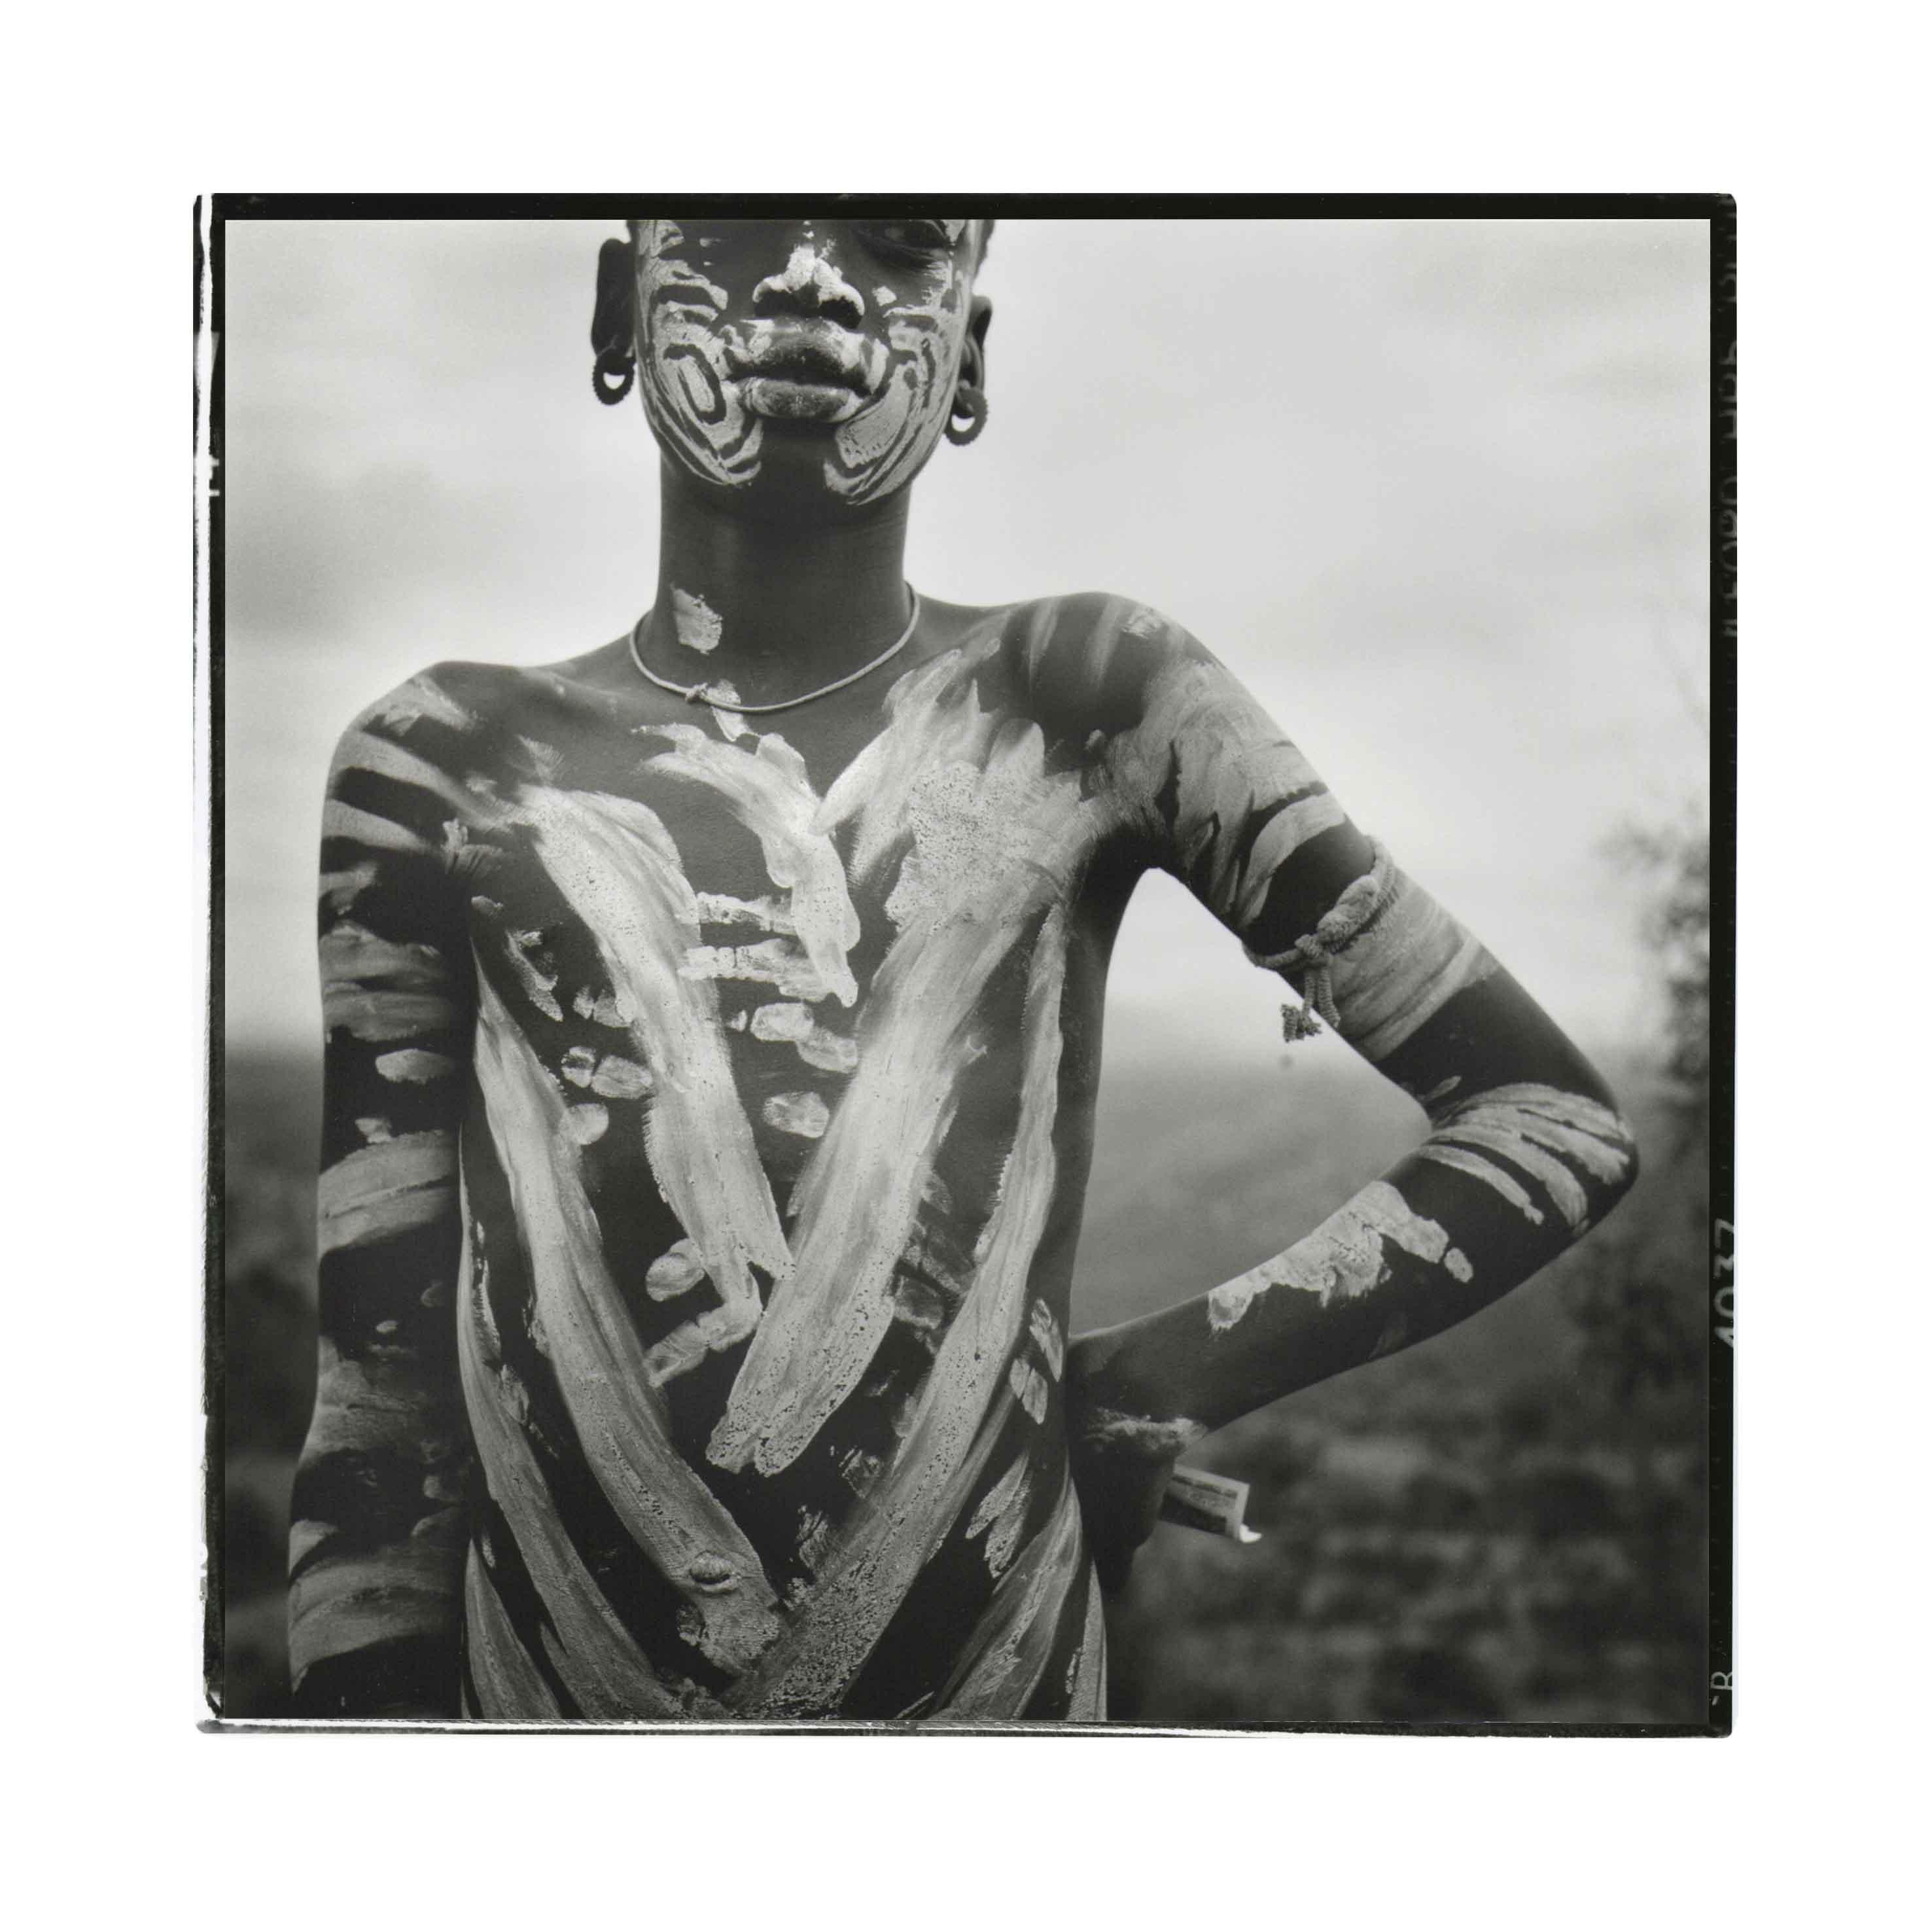 Etíope 3, 2012<br/>Gelatinoclorobromuro de plata / Silver gelatin print